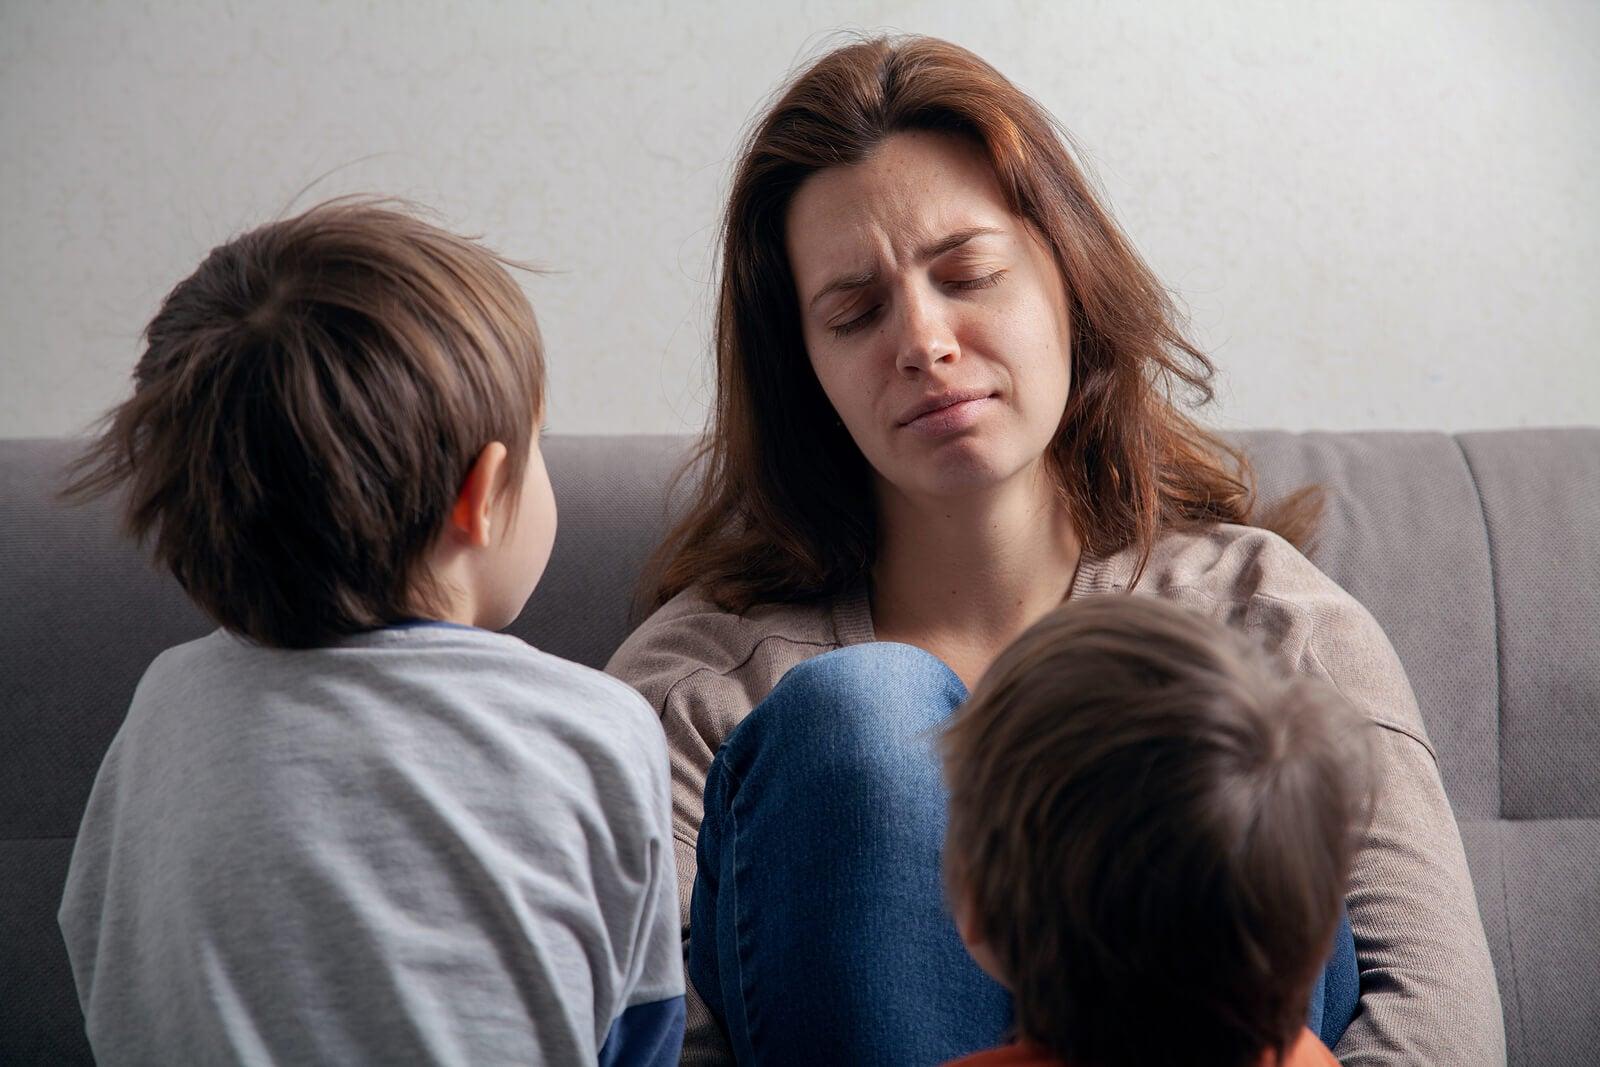 Aprender a delegar para disfrutar la maternidad